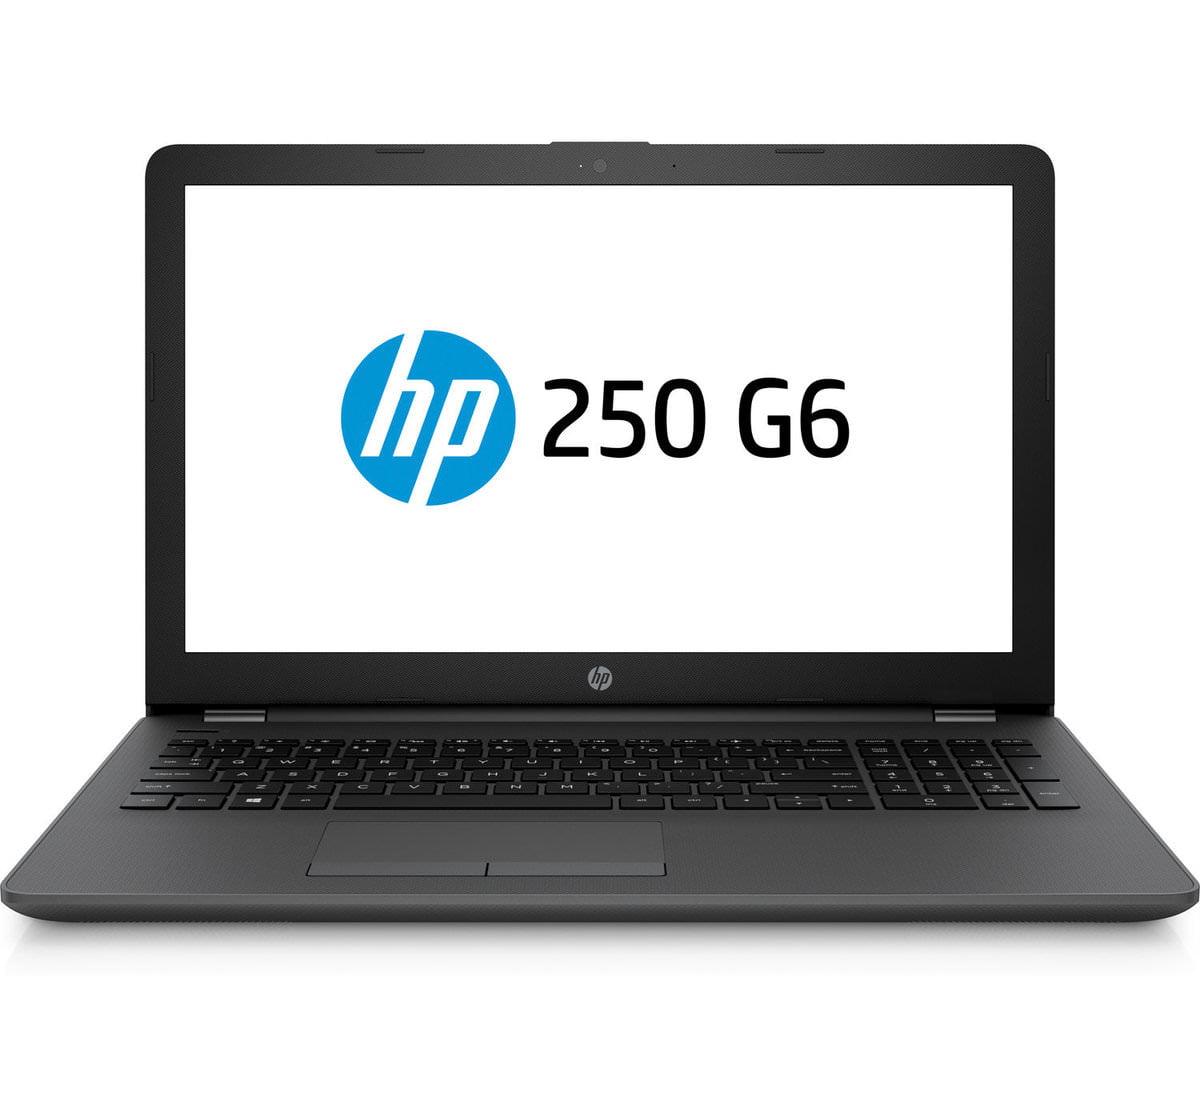 "HP 250 G6 15.6"" LCD Notebook - Intel Core i3 (7th Gen) i3-7020U Dual-core (2 Core) 2.3GHz - 4GB DDR4 SDRAM - 500GB HDD - Windows 10 Pro"